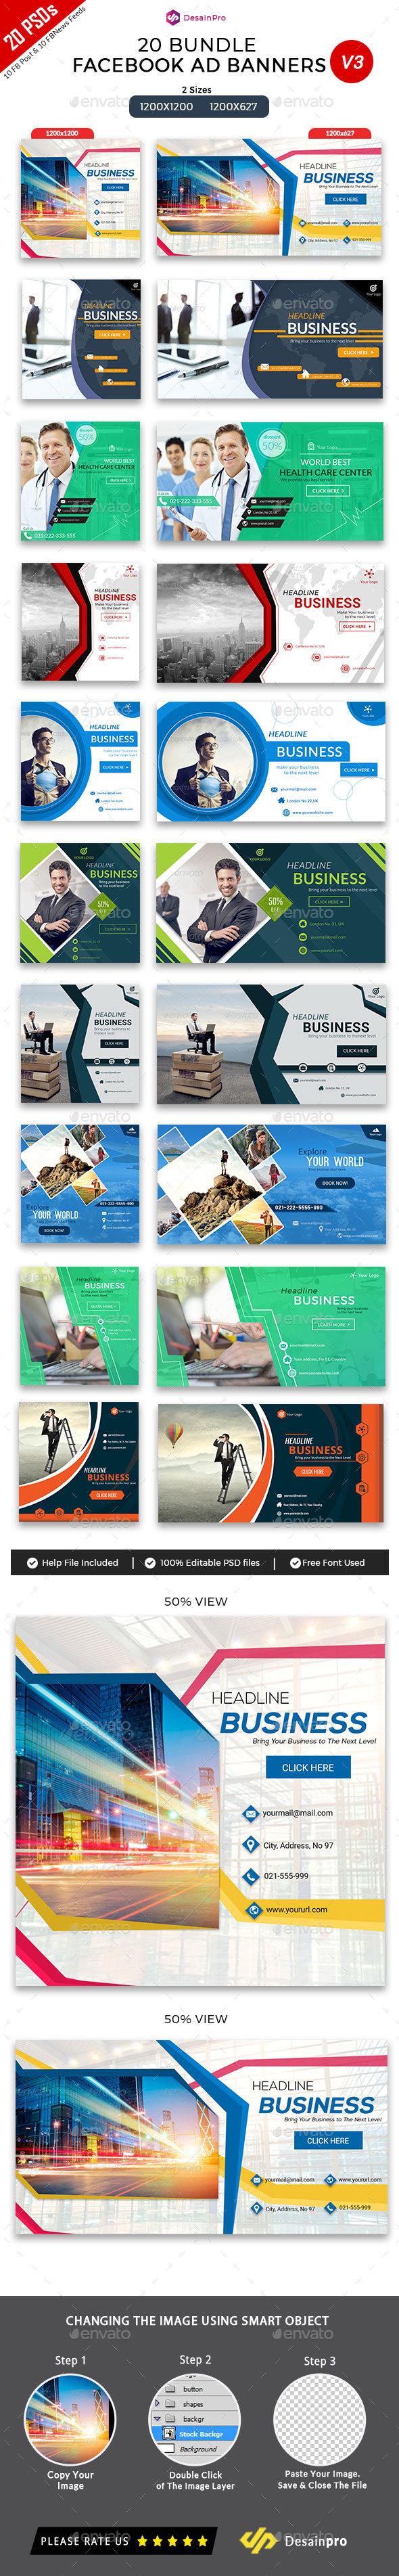 20 Facebook Ad Banners V3 Bundle - AR - Social Media Web Elements